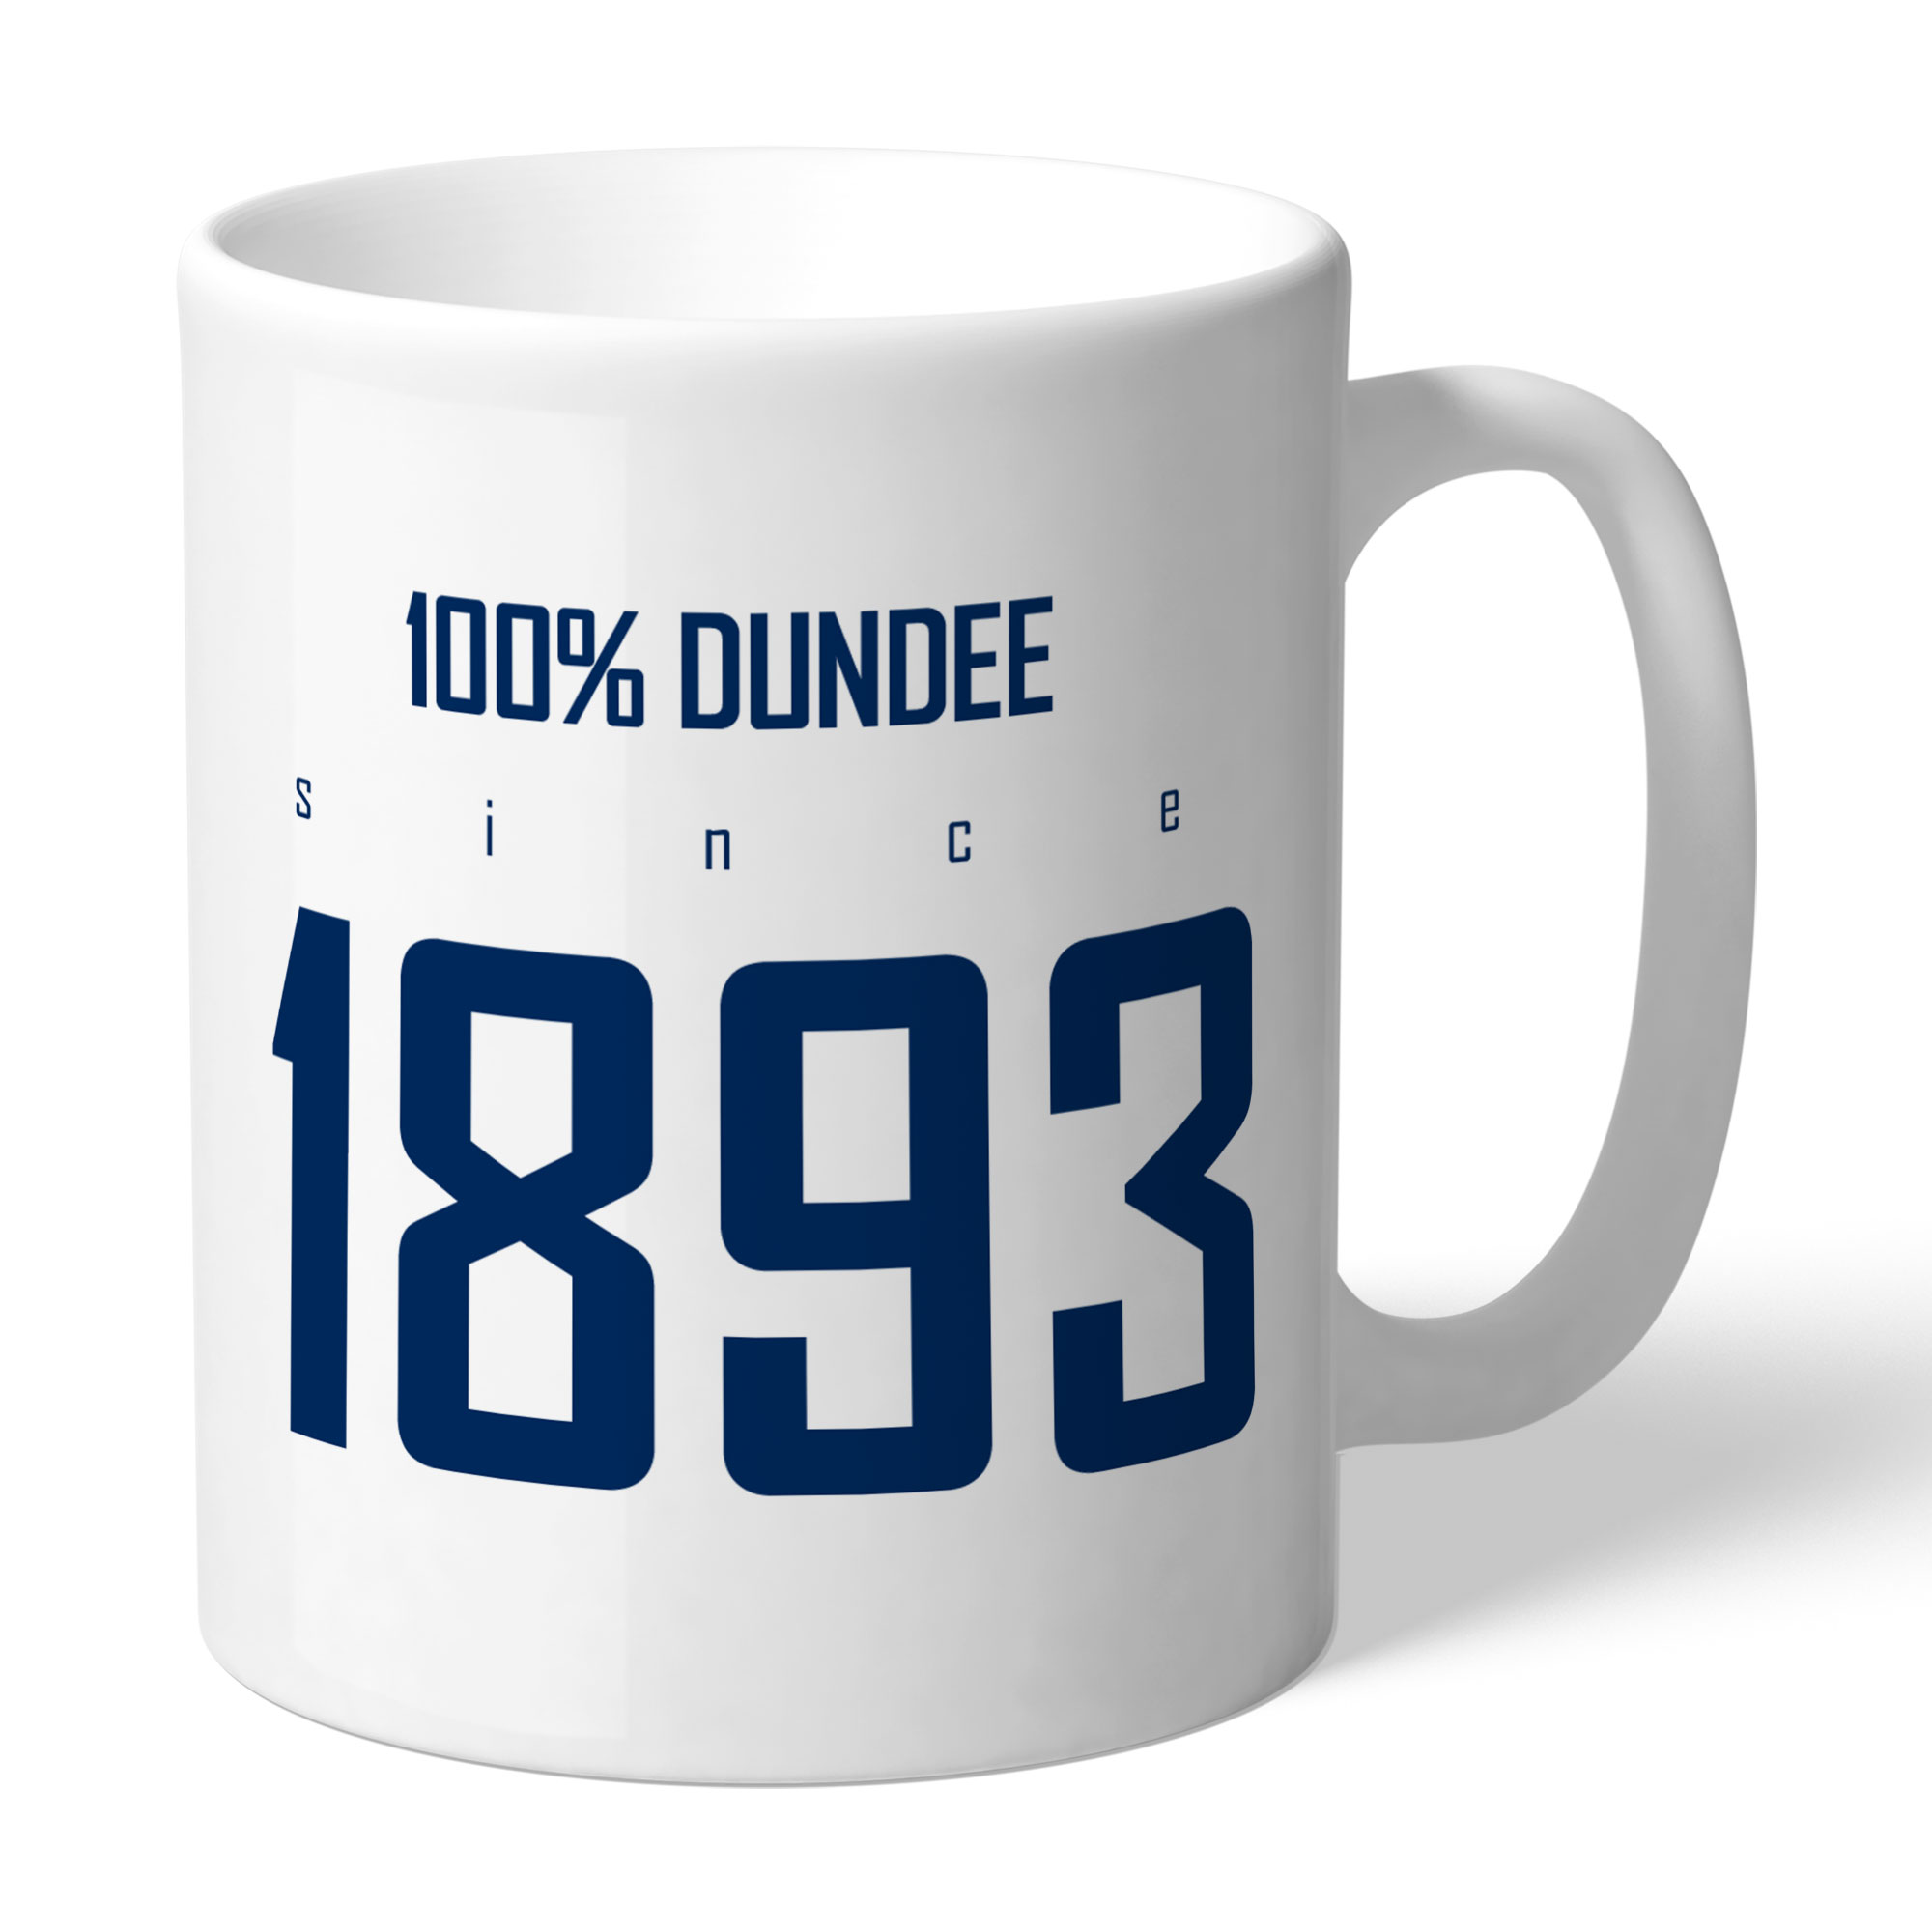 Dundee FC 100 Percent Mug